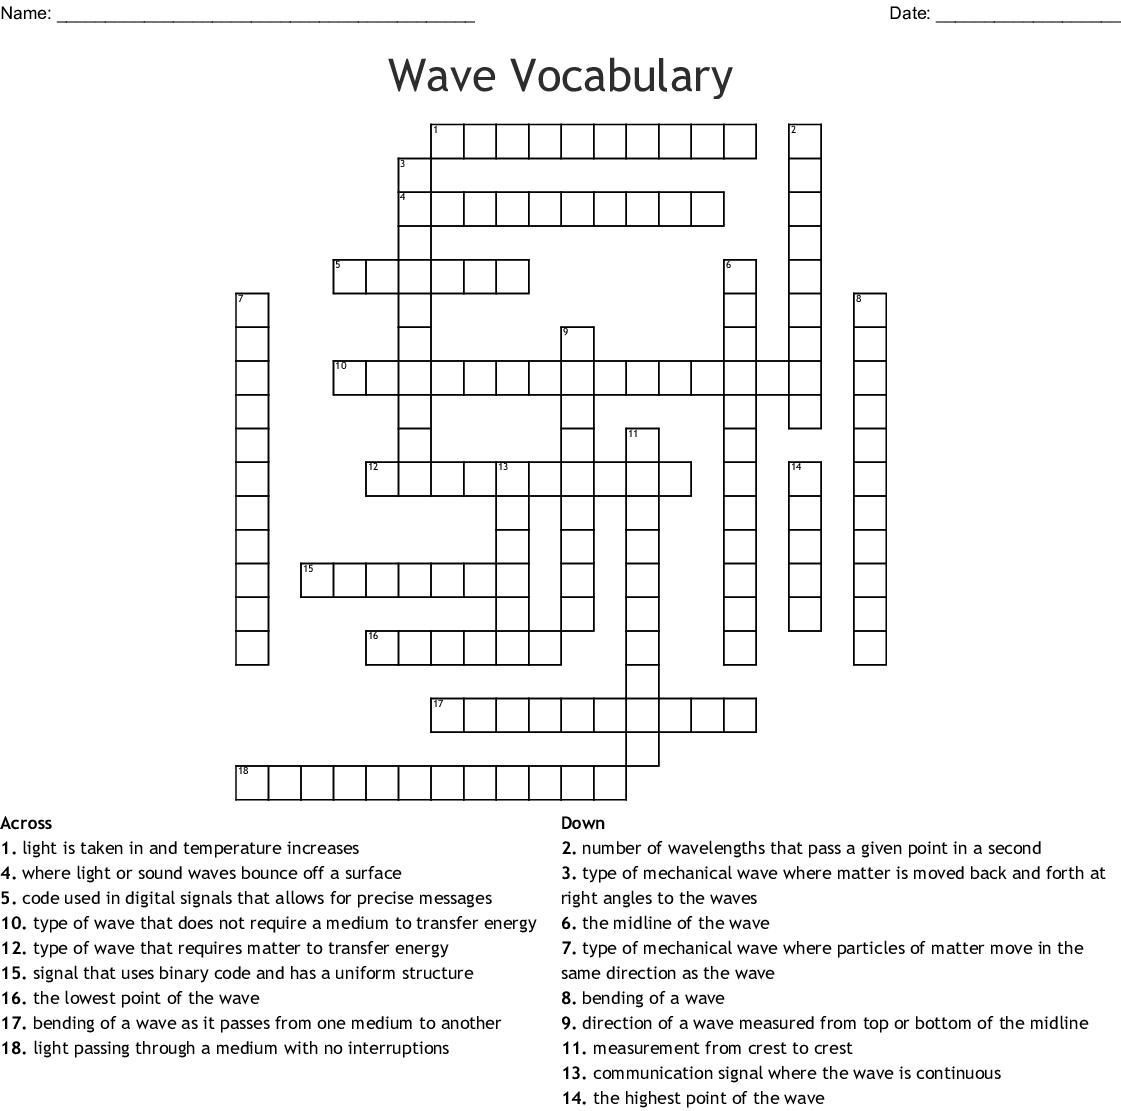 Waves Worksheet Answer Key